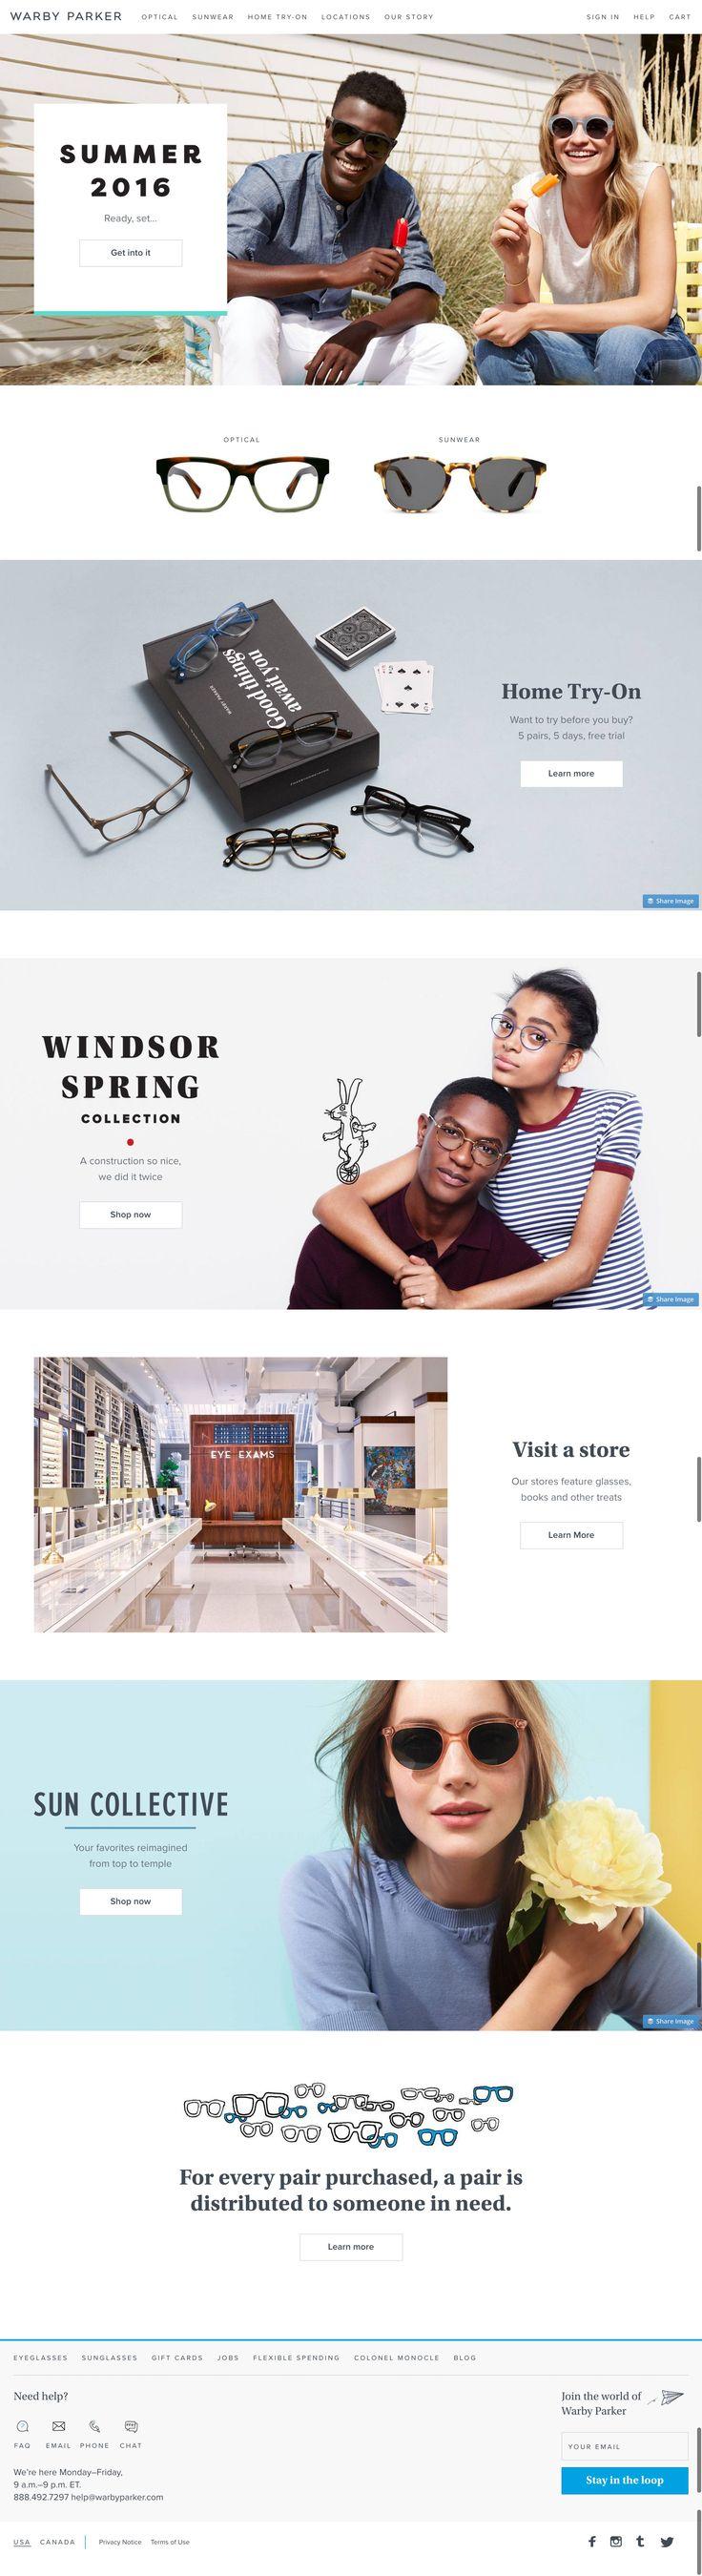 Online Eyeglasses, Sunglasses, Rx Glasses – Warby Parker